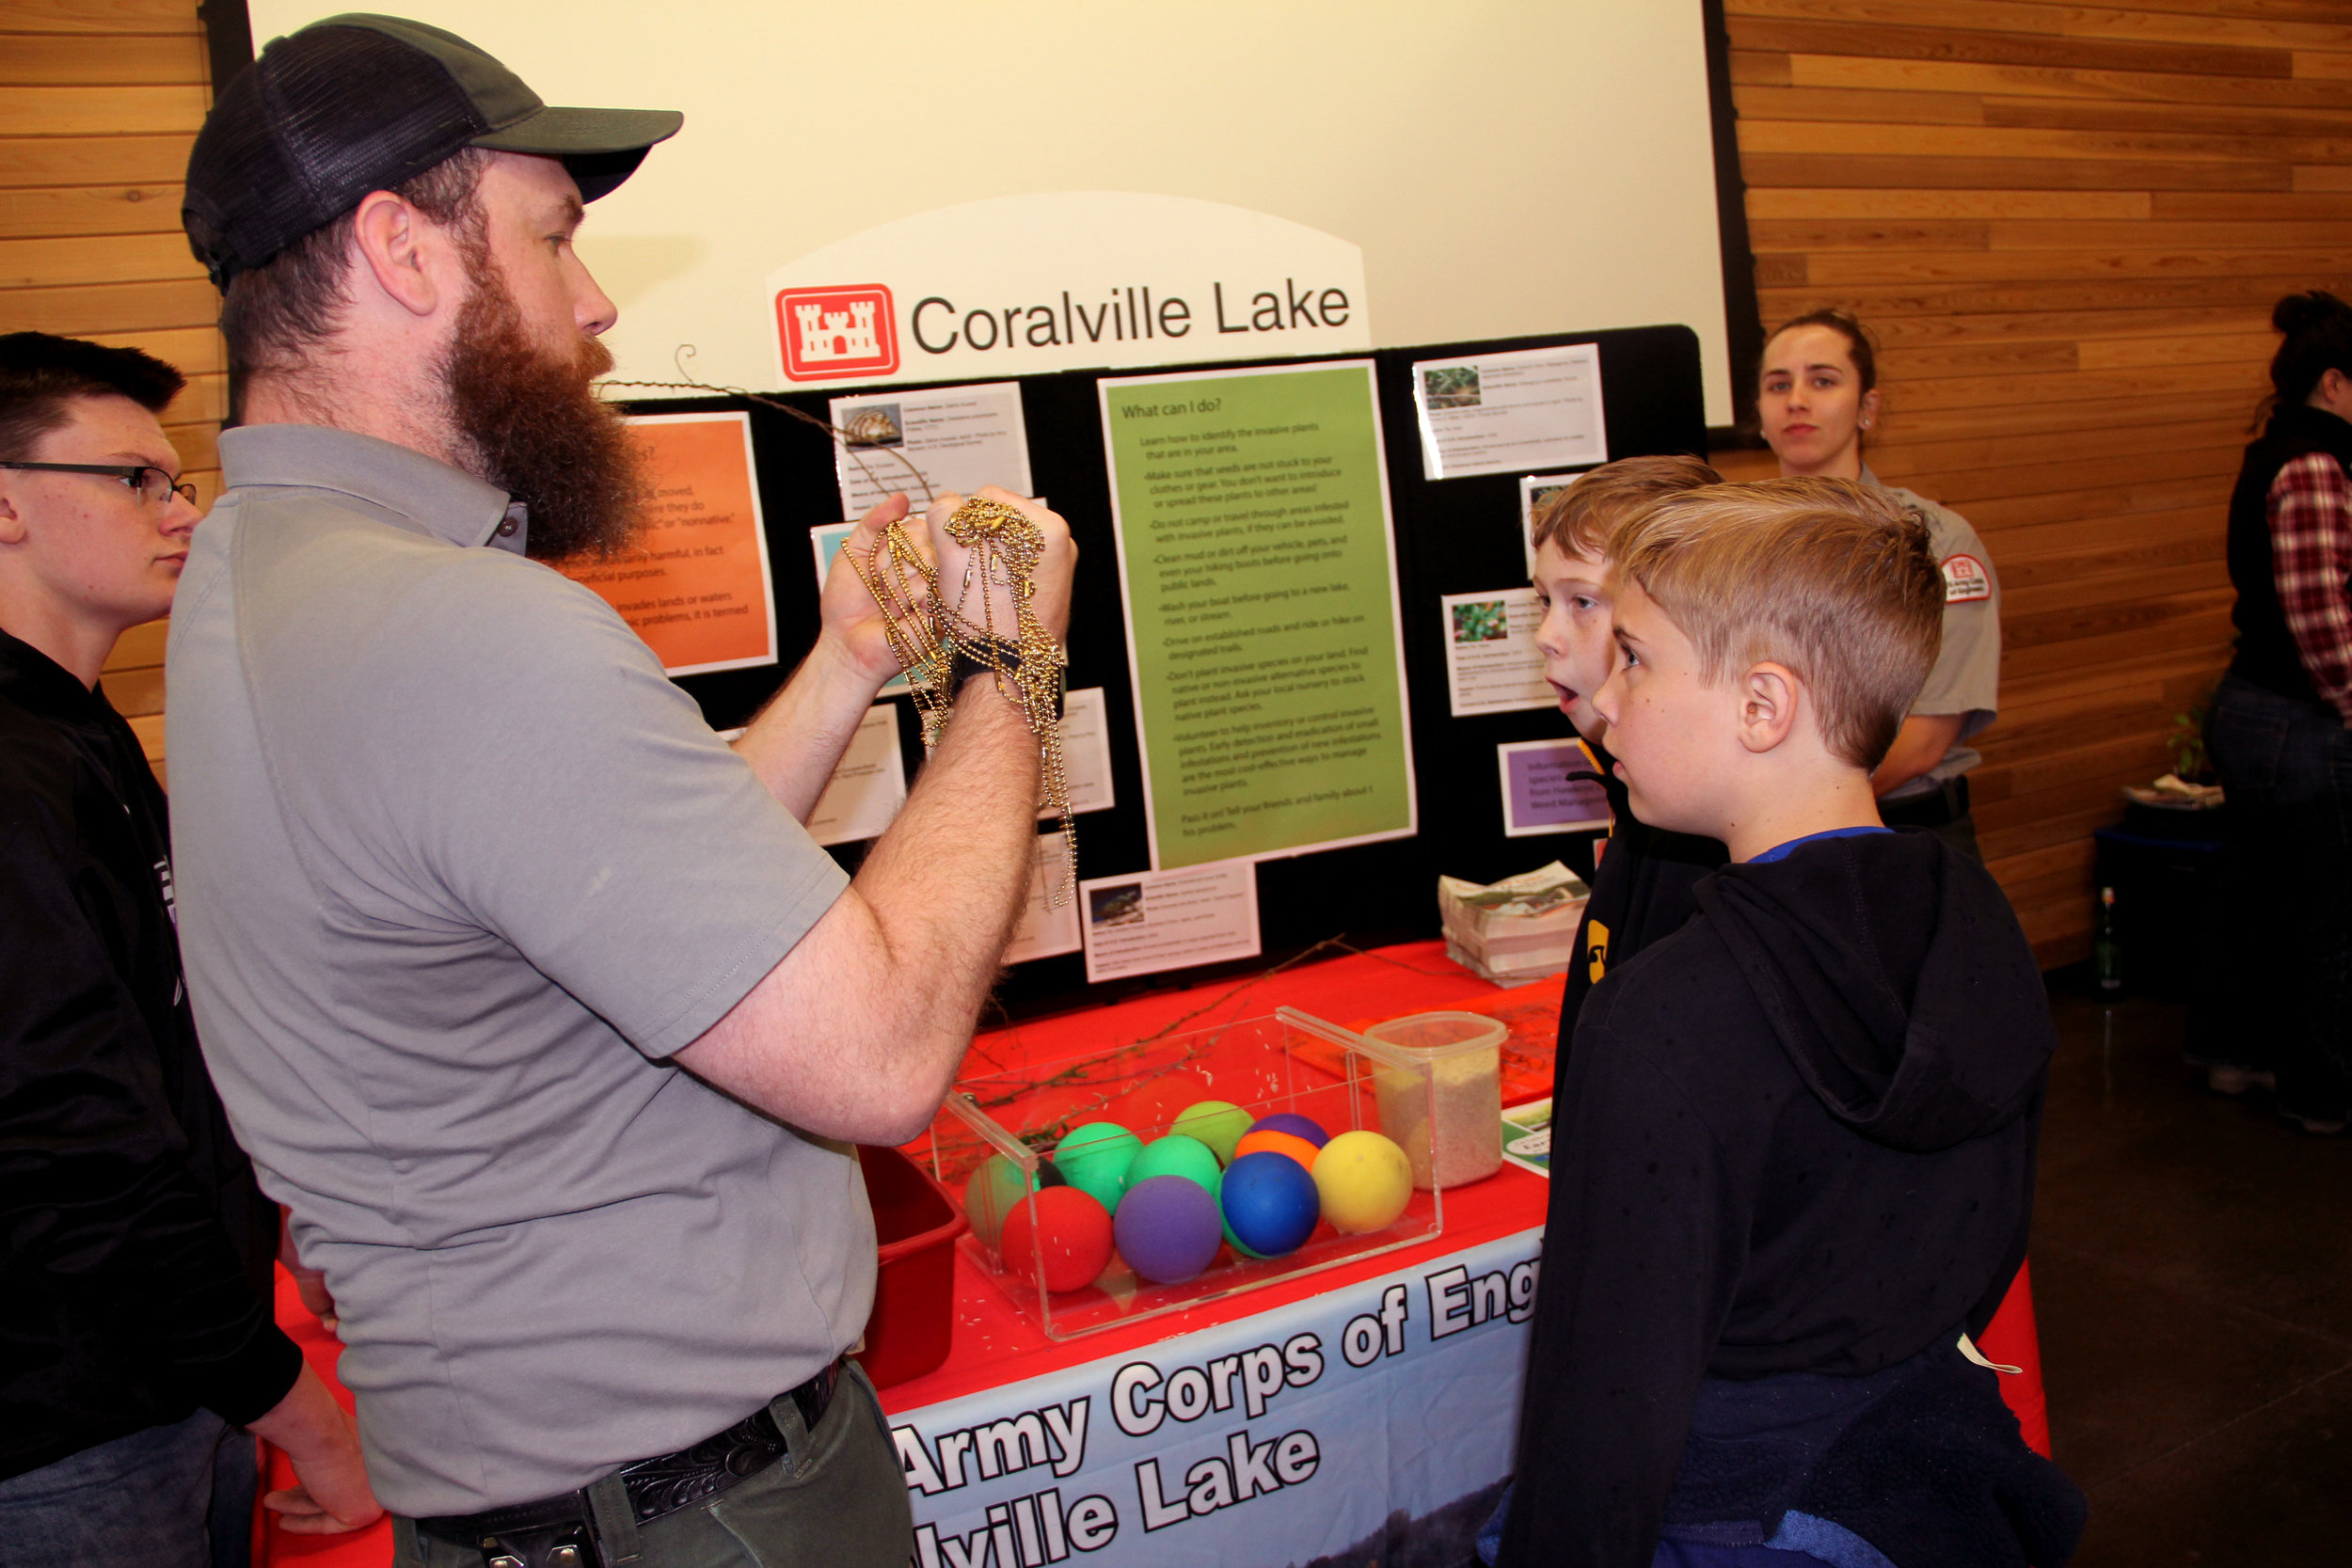 A volunteer teaches kids about invasive species